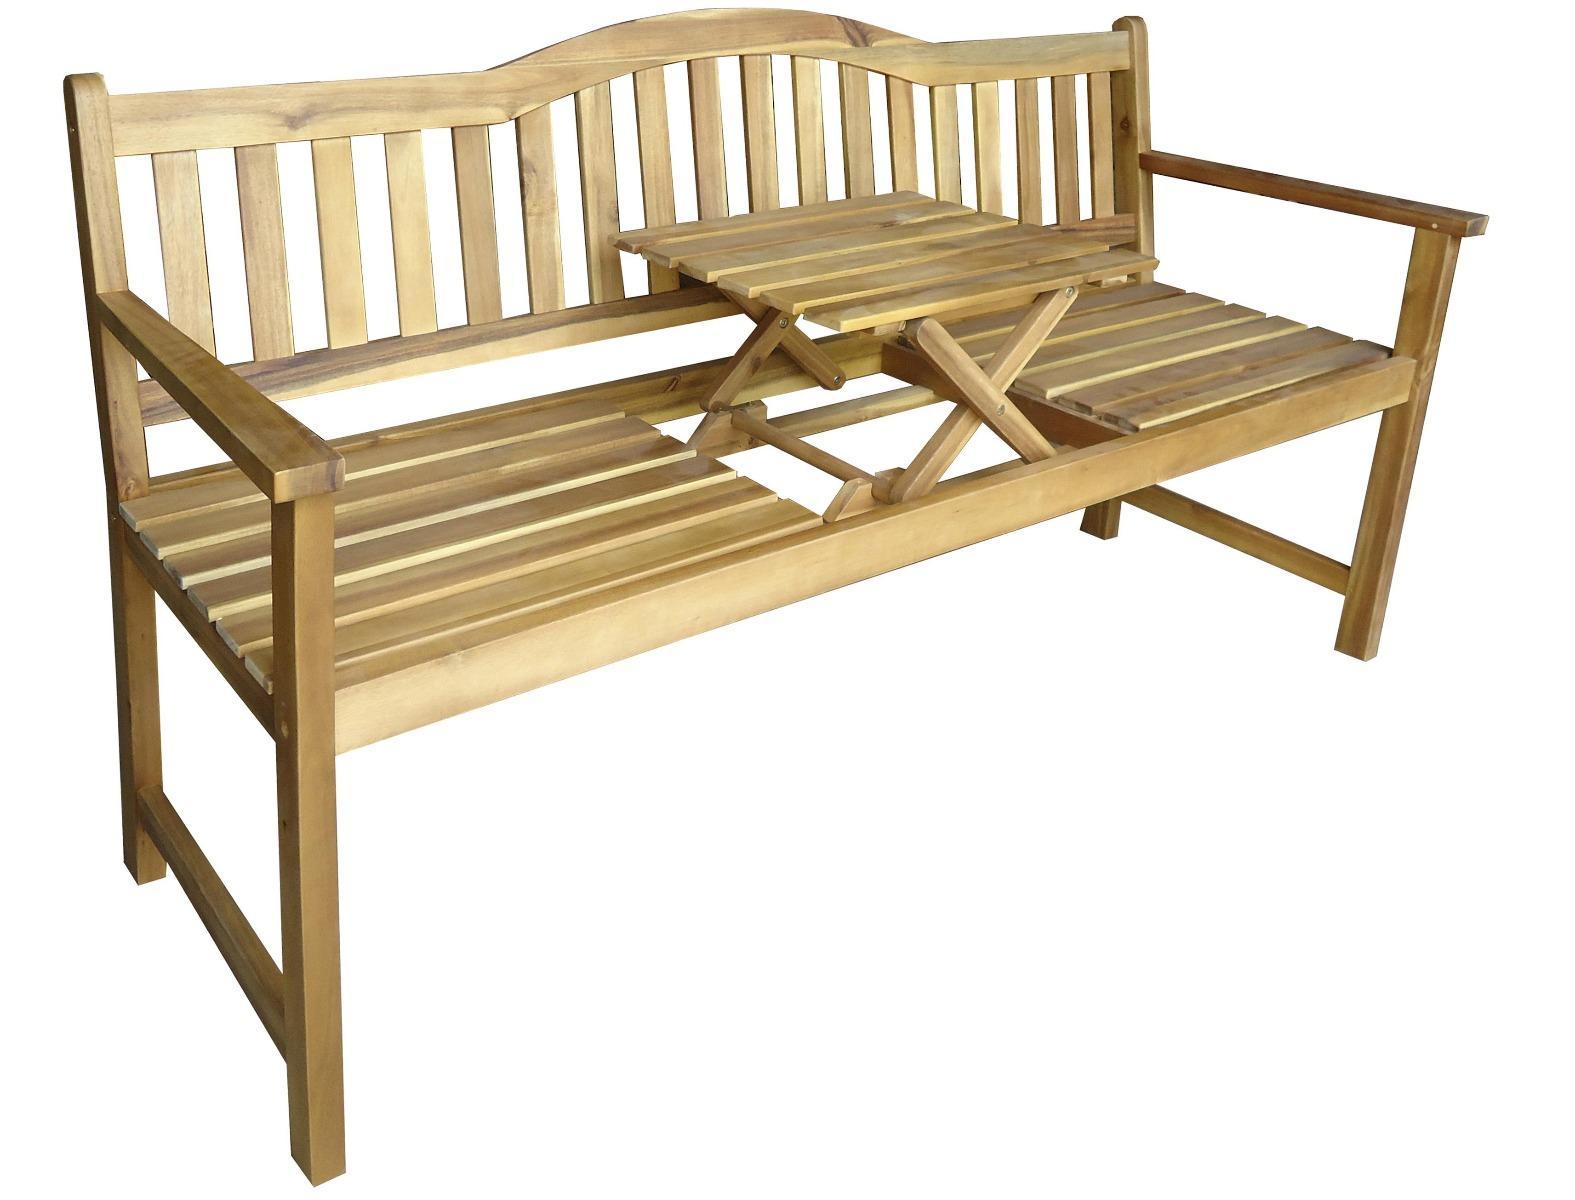 Korting Sarah bench with coffee table 59x156x86cm